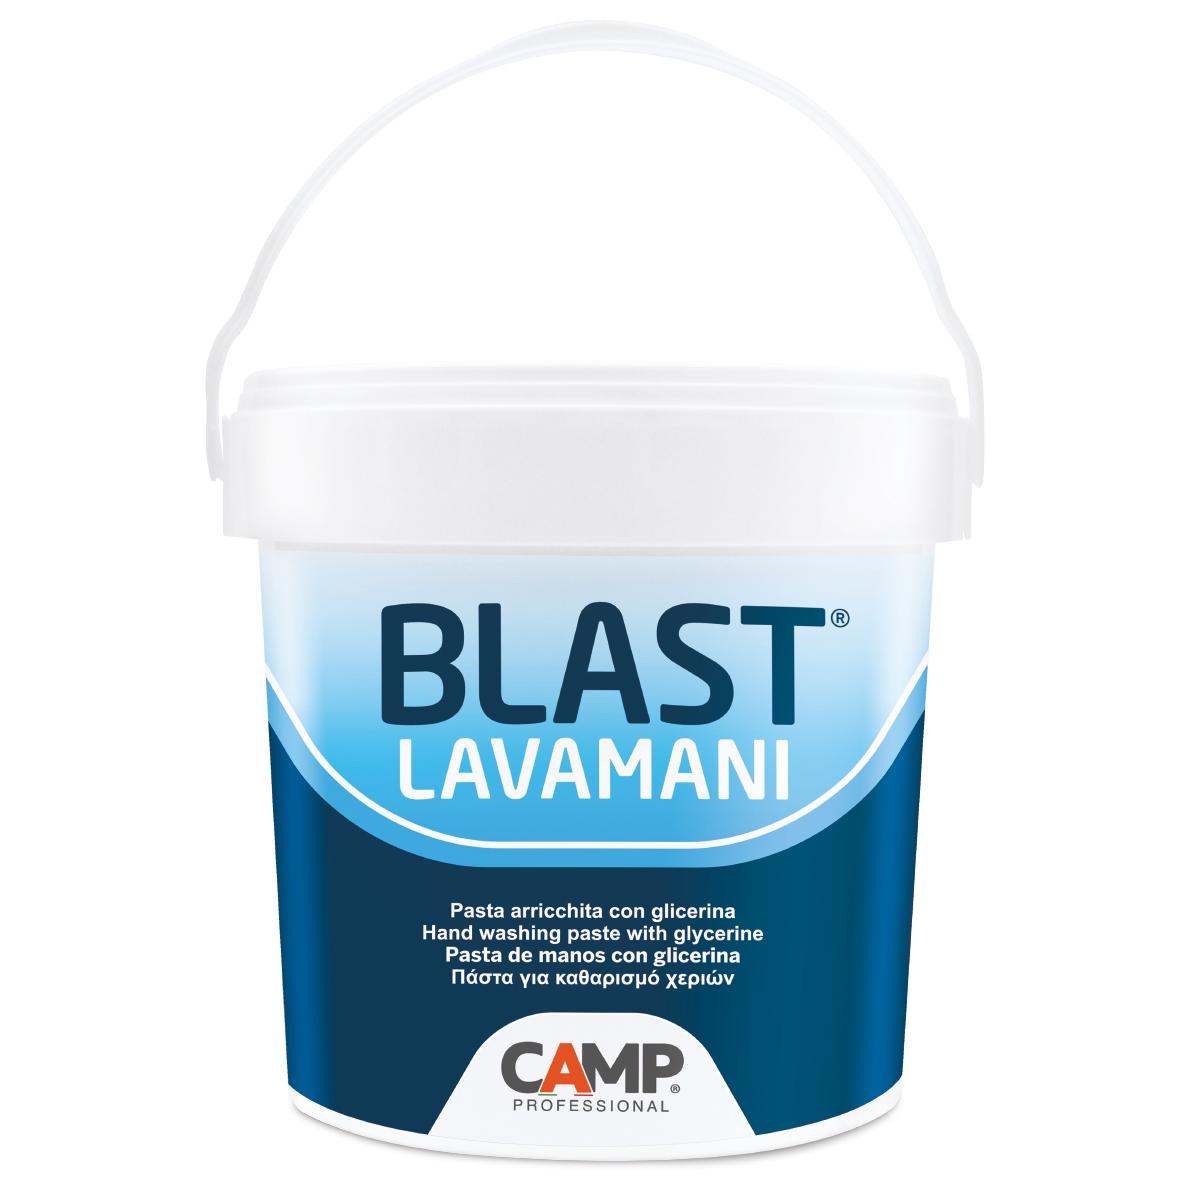 Blast pasta lavamani 1000ml